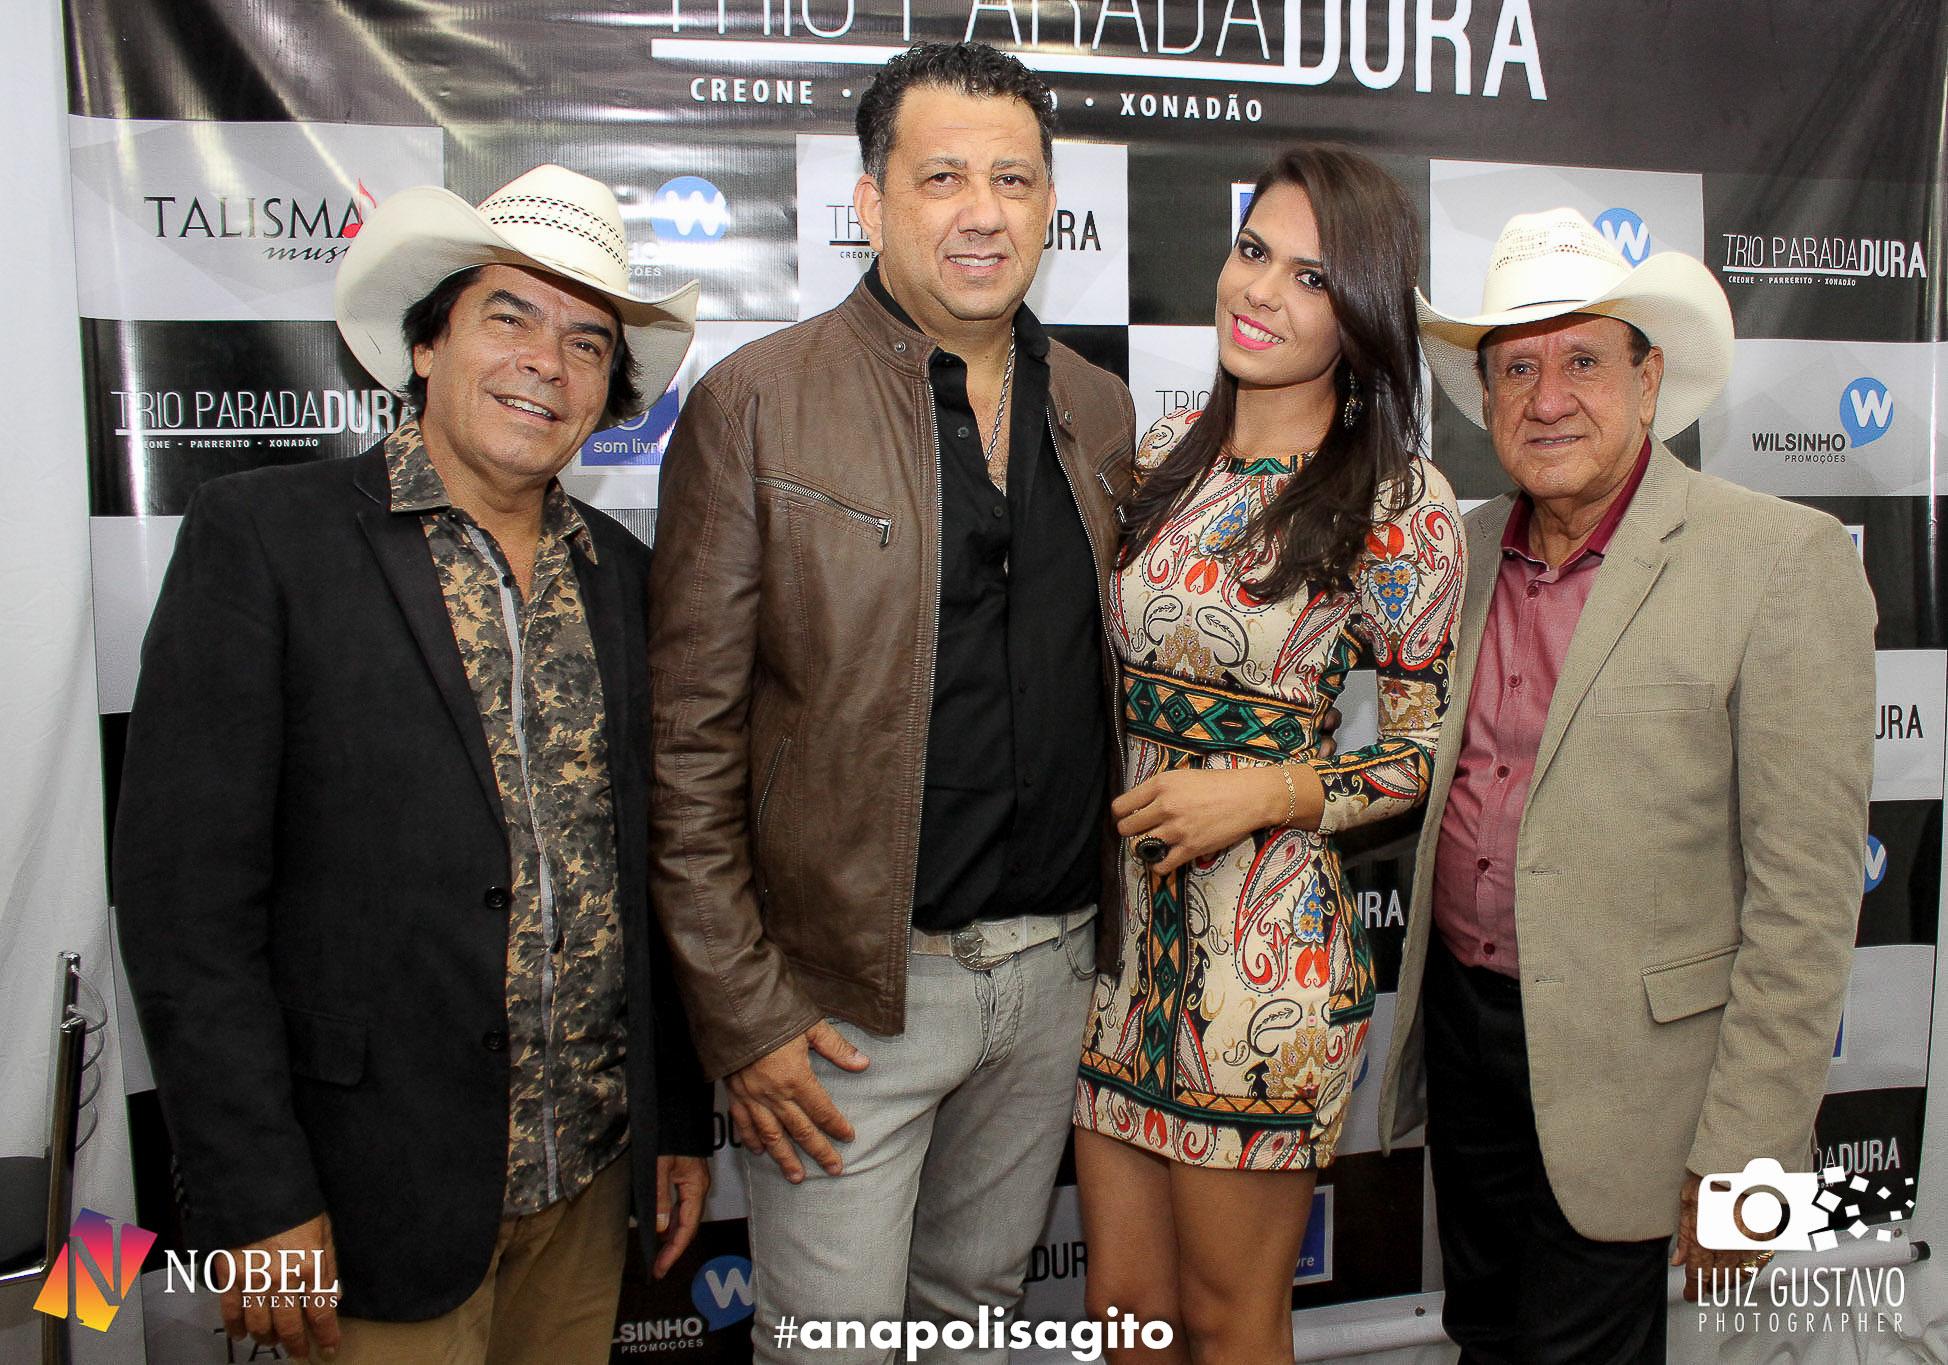 Luiz Gustavo Photographer-156